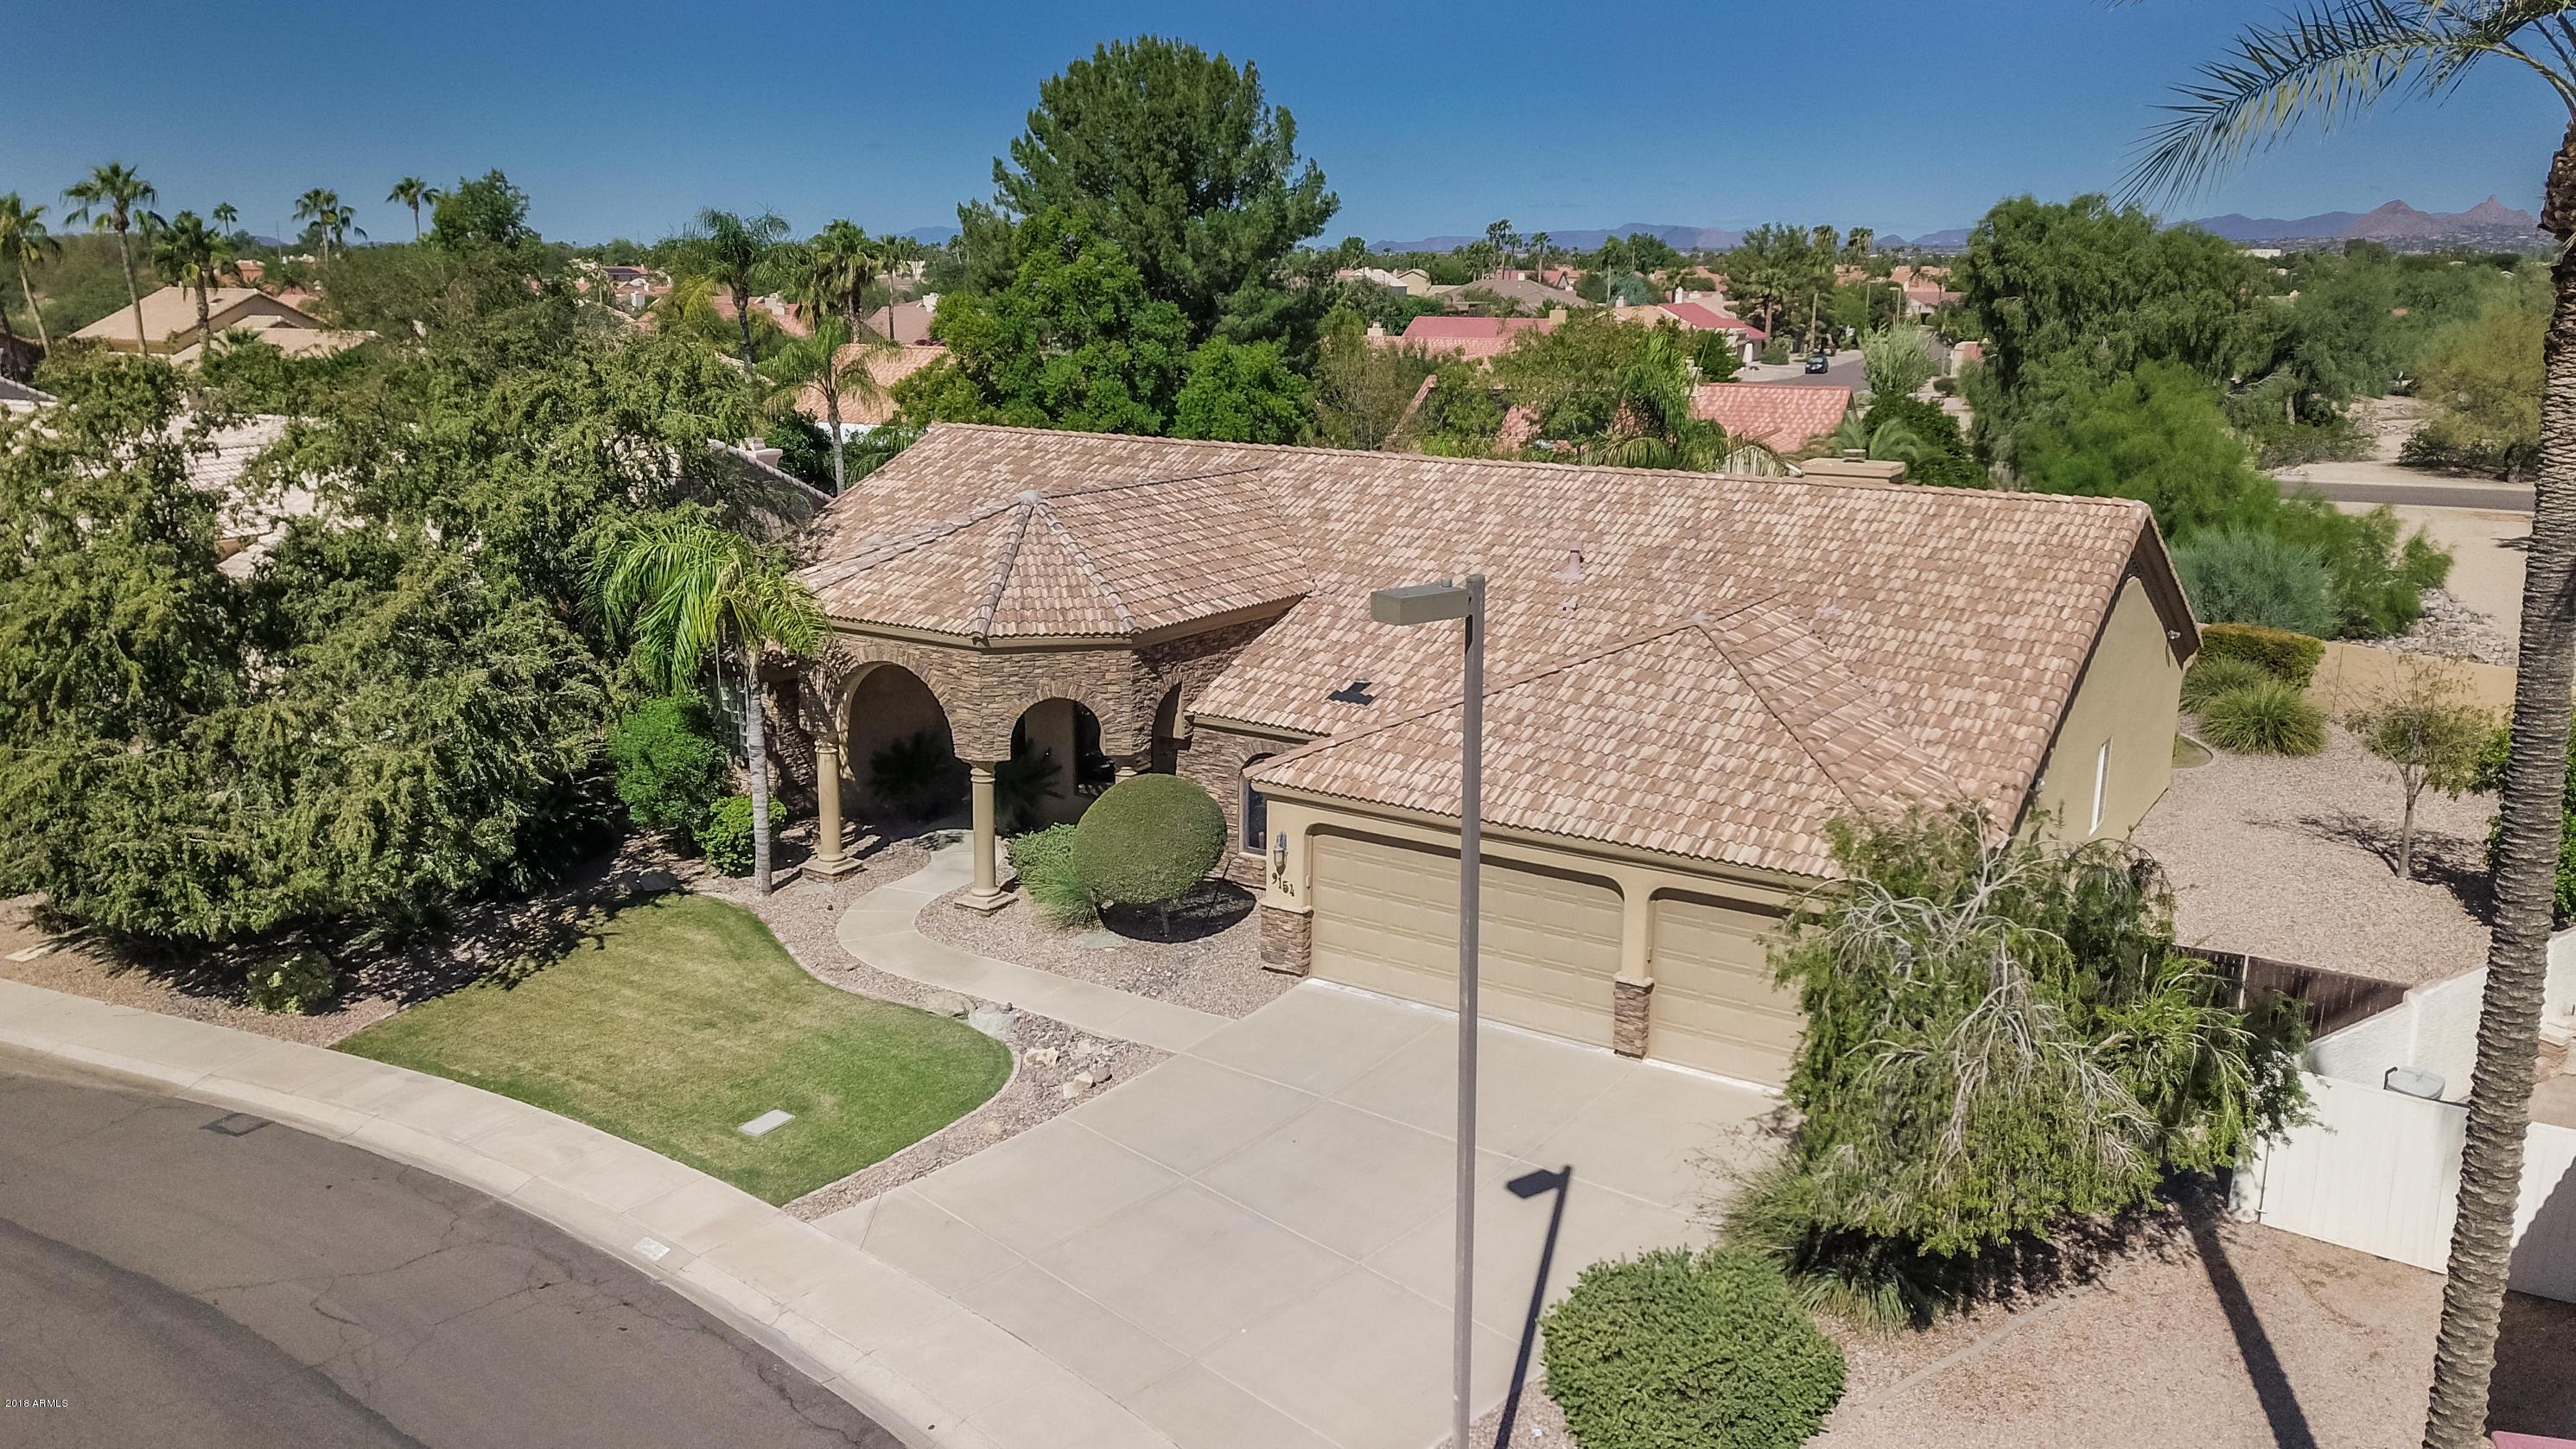 MLS 5836148 9154 E CHARTER OAK Drive, Scottsdale, AZ 85260 Scottsdale AZ Scottsdale Mountain